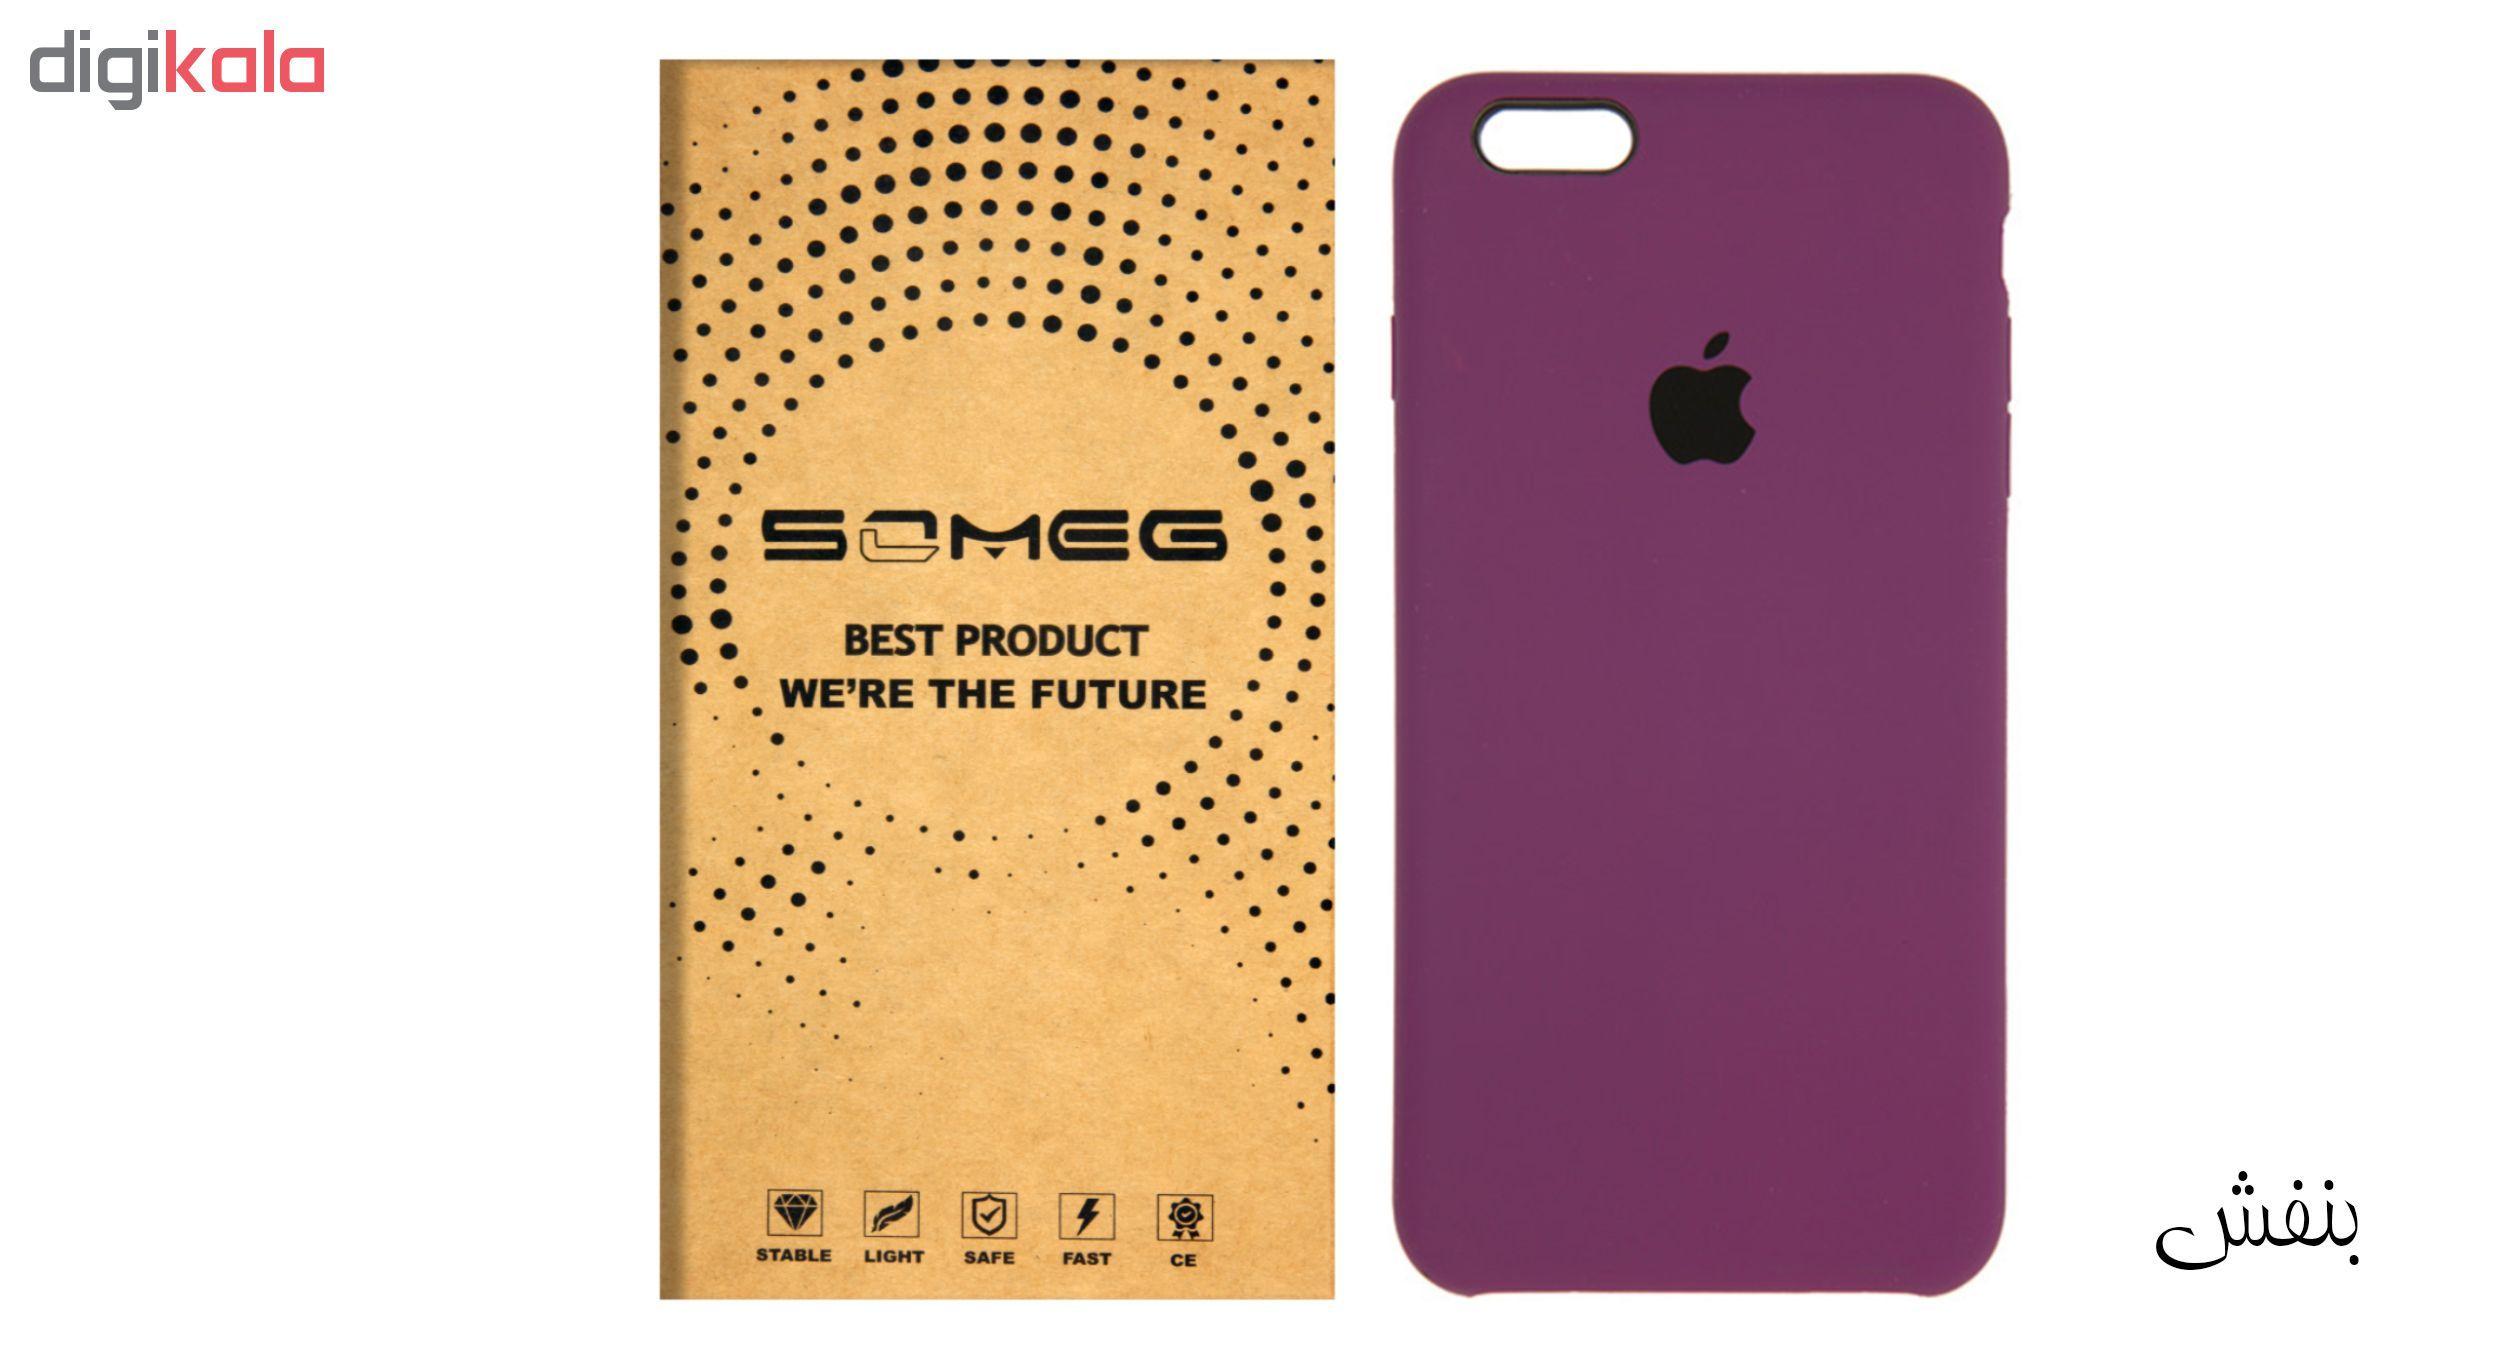 کاور سومگ مدل SIC مناسب برای گوشی موبایل اپل iPhone 6/6s main 1 16